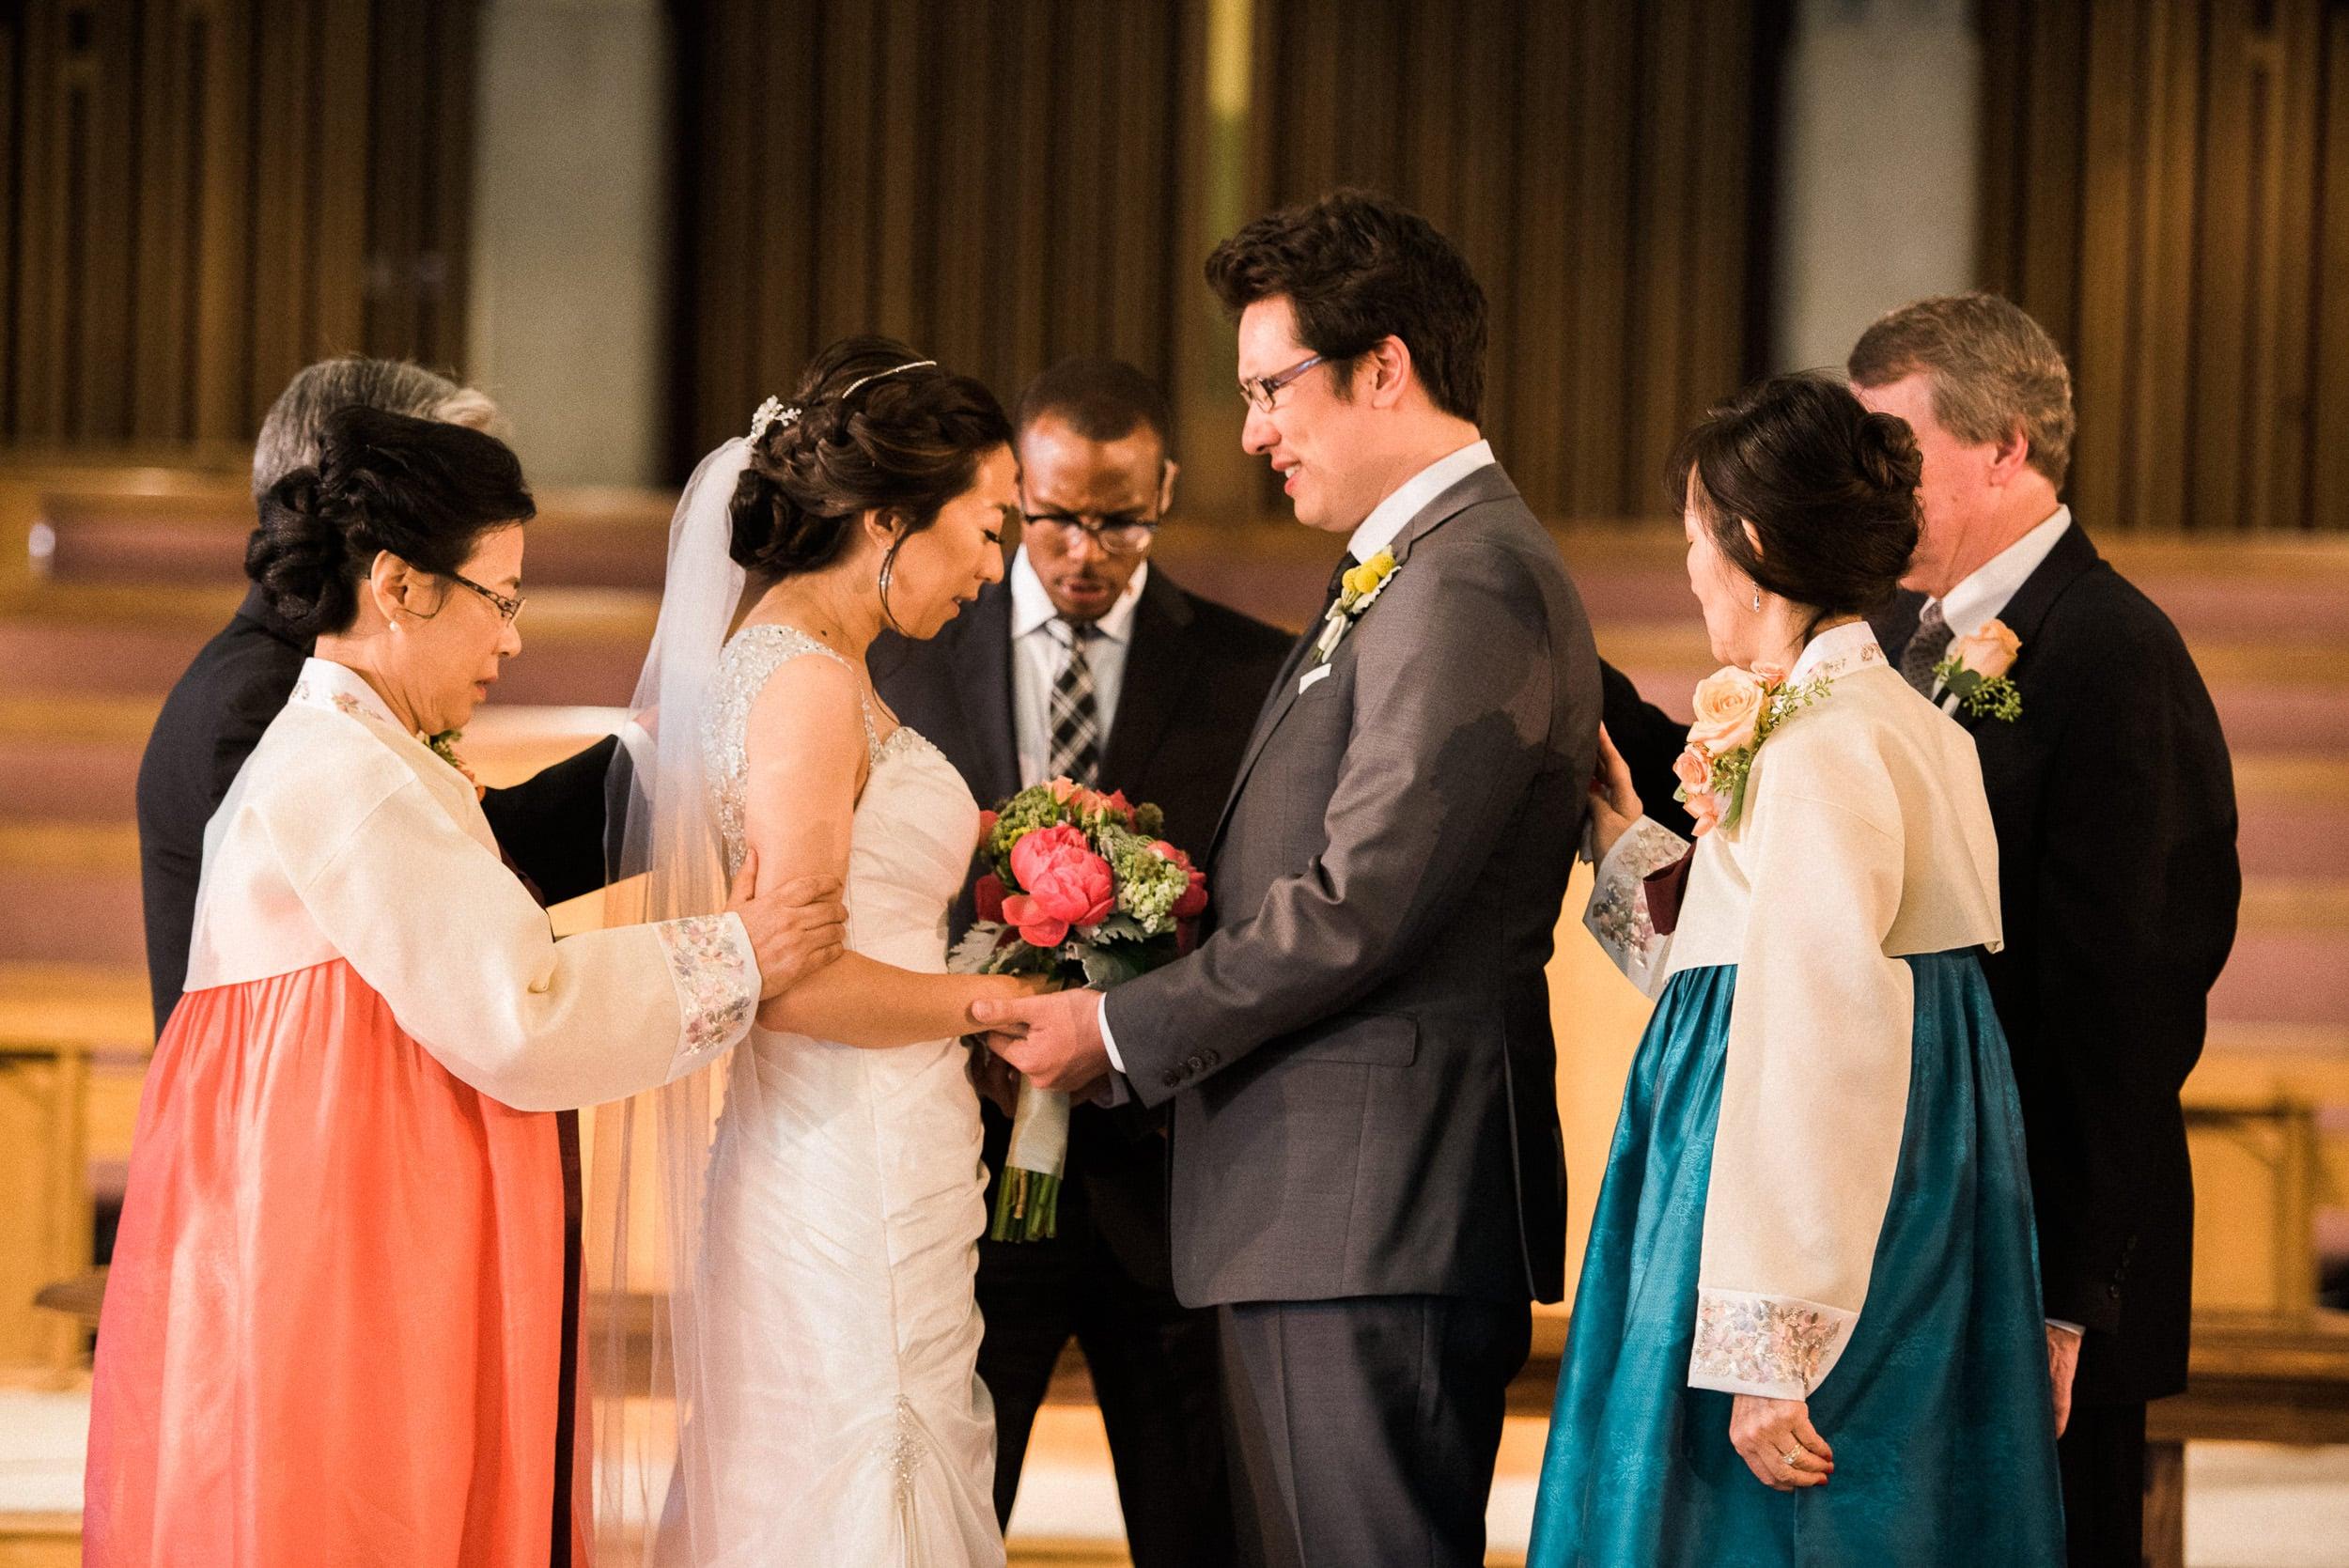 Moraga Valley Church wedding 045.jpg